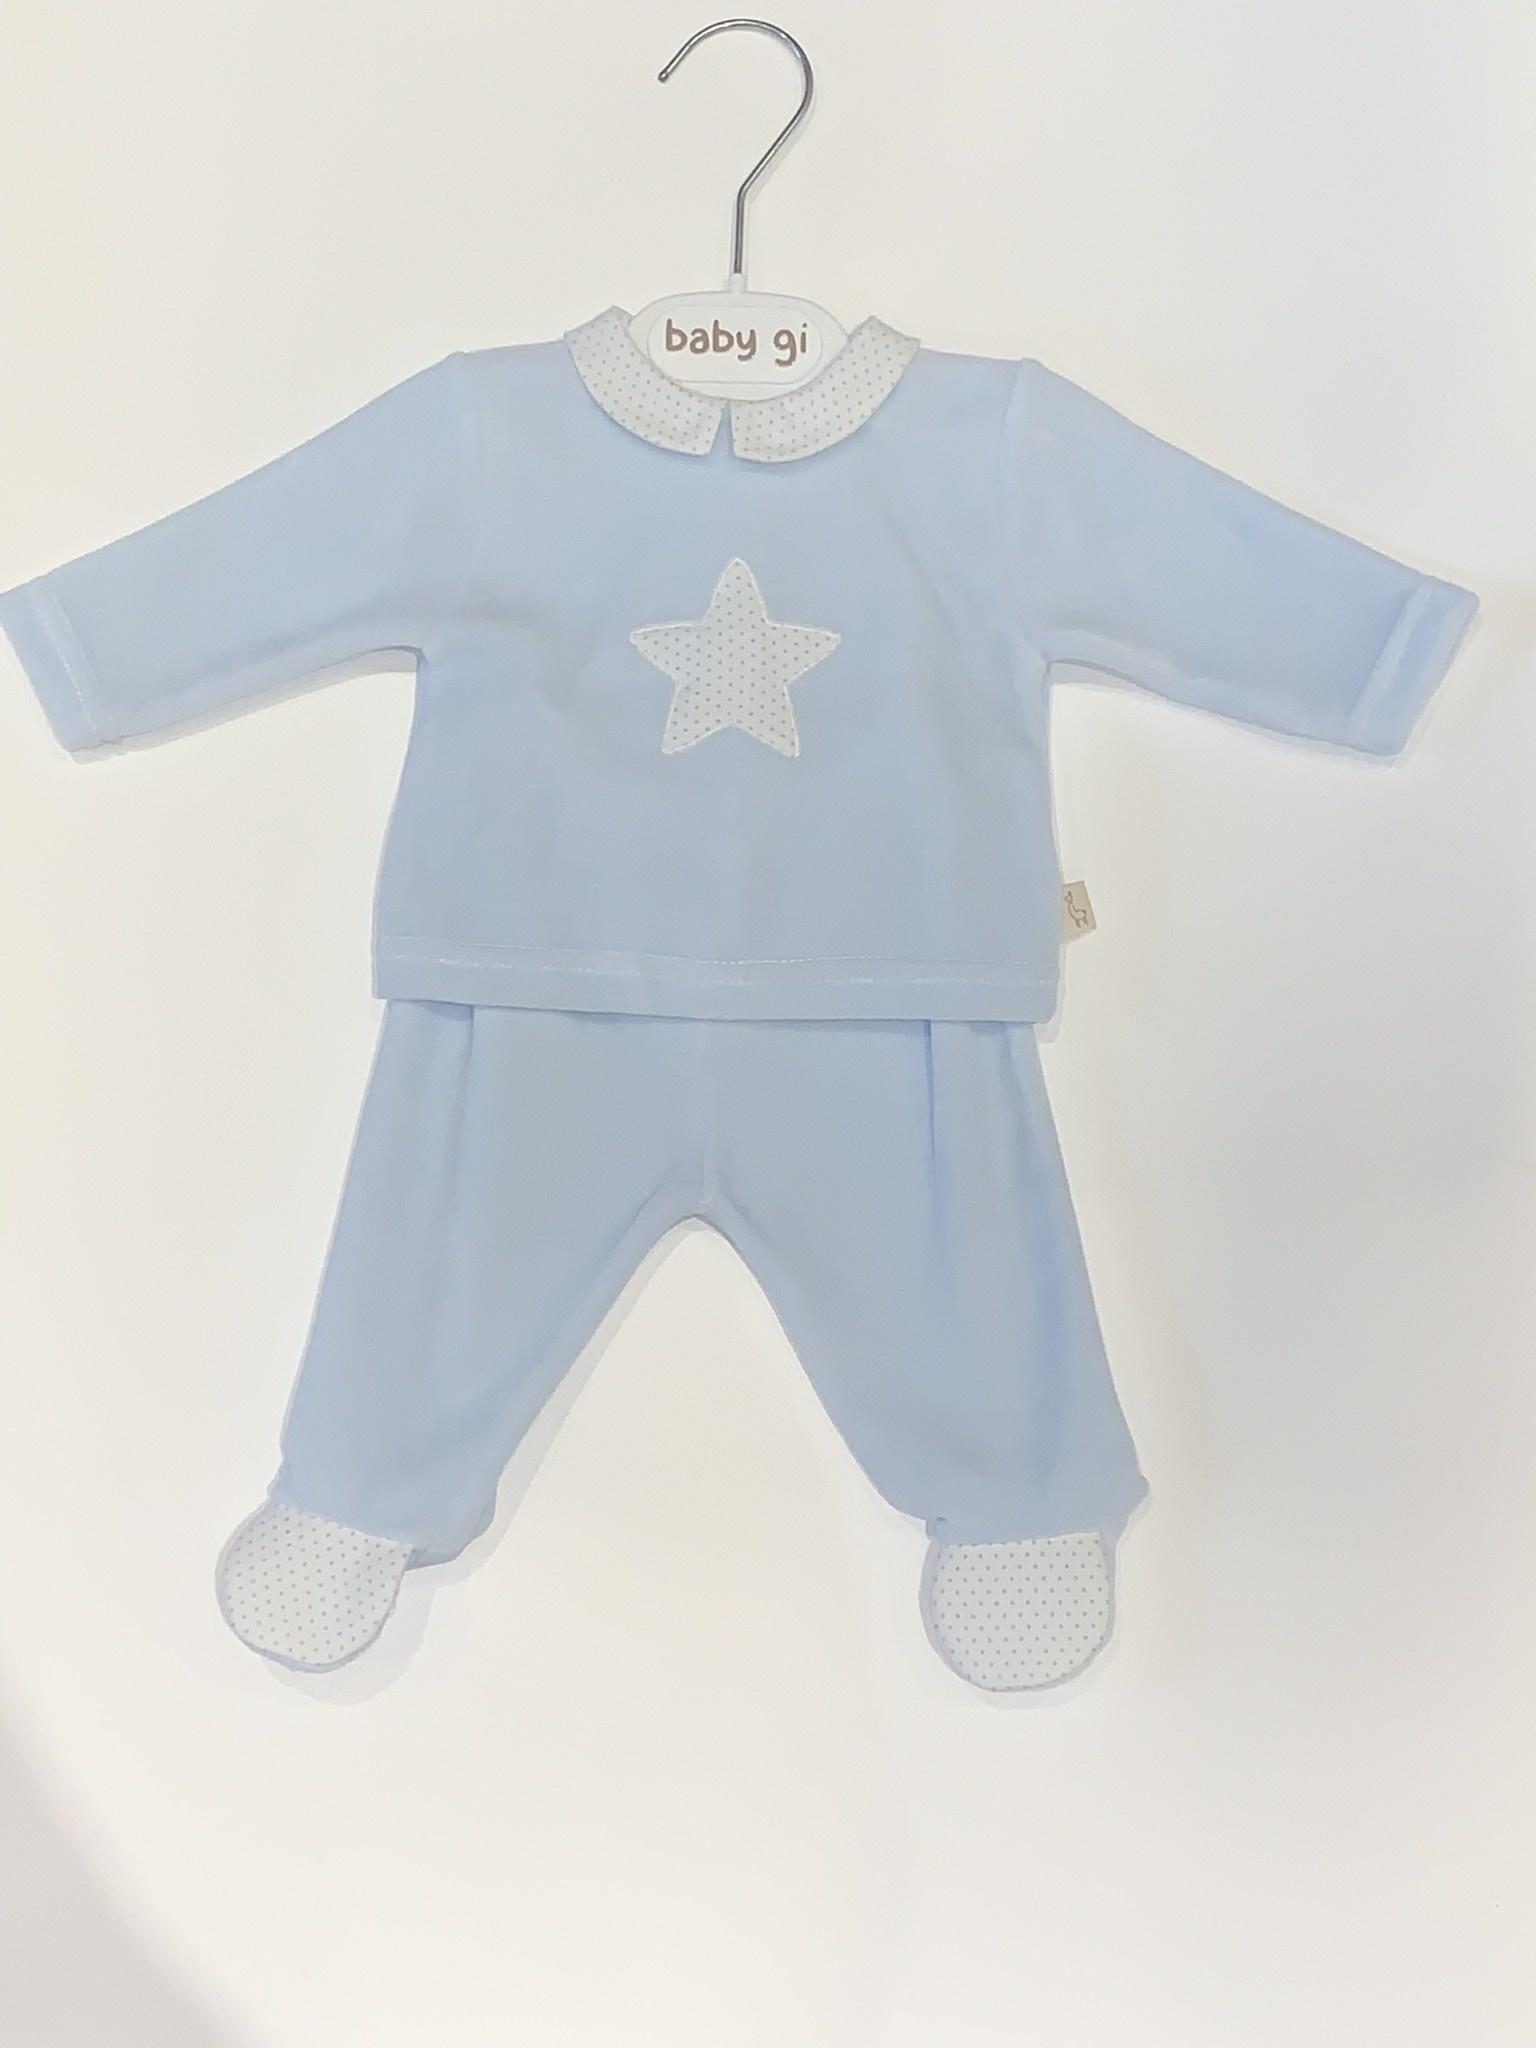 Baby Gi Baby gi blue 2 piece velour star set